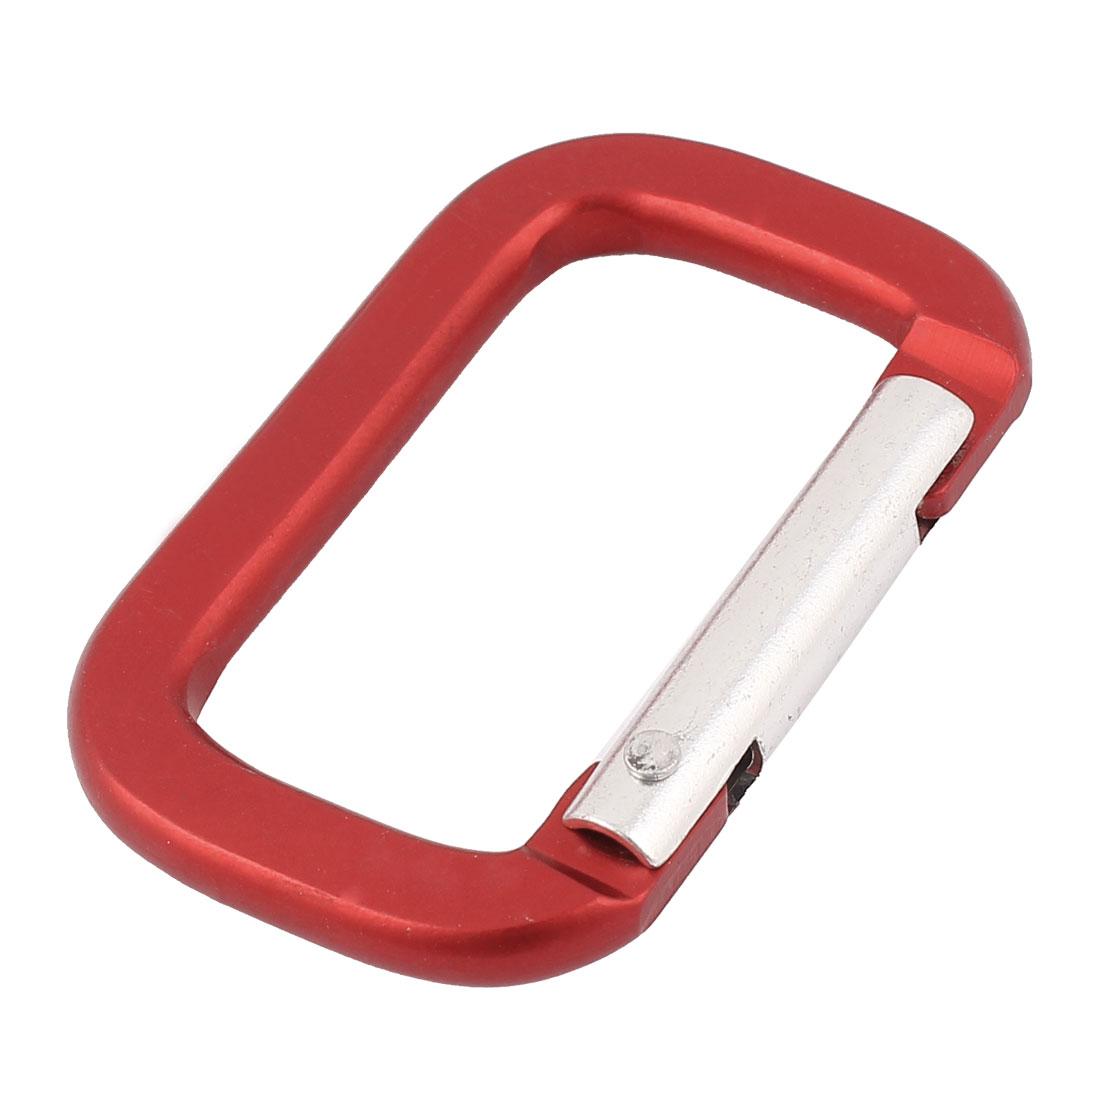 Camping Hiking Sport Karabiner Carabiner Clip Snap Hook Keychain Keyring Red